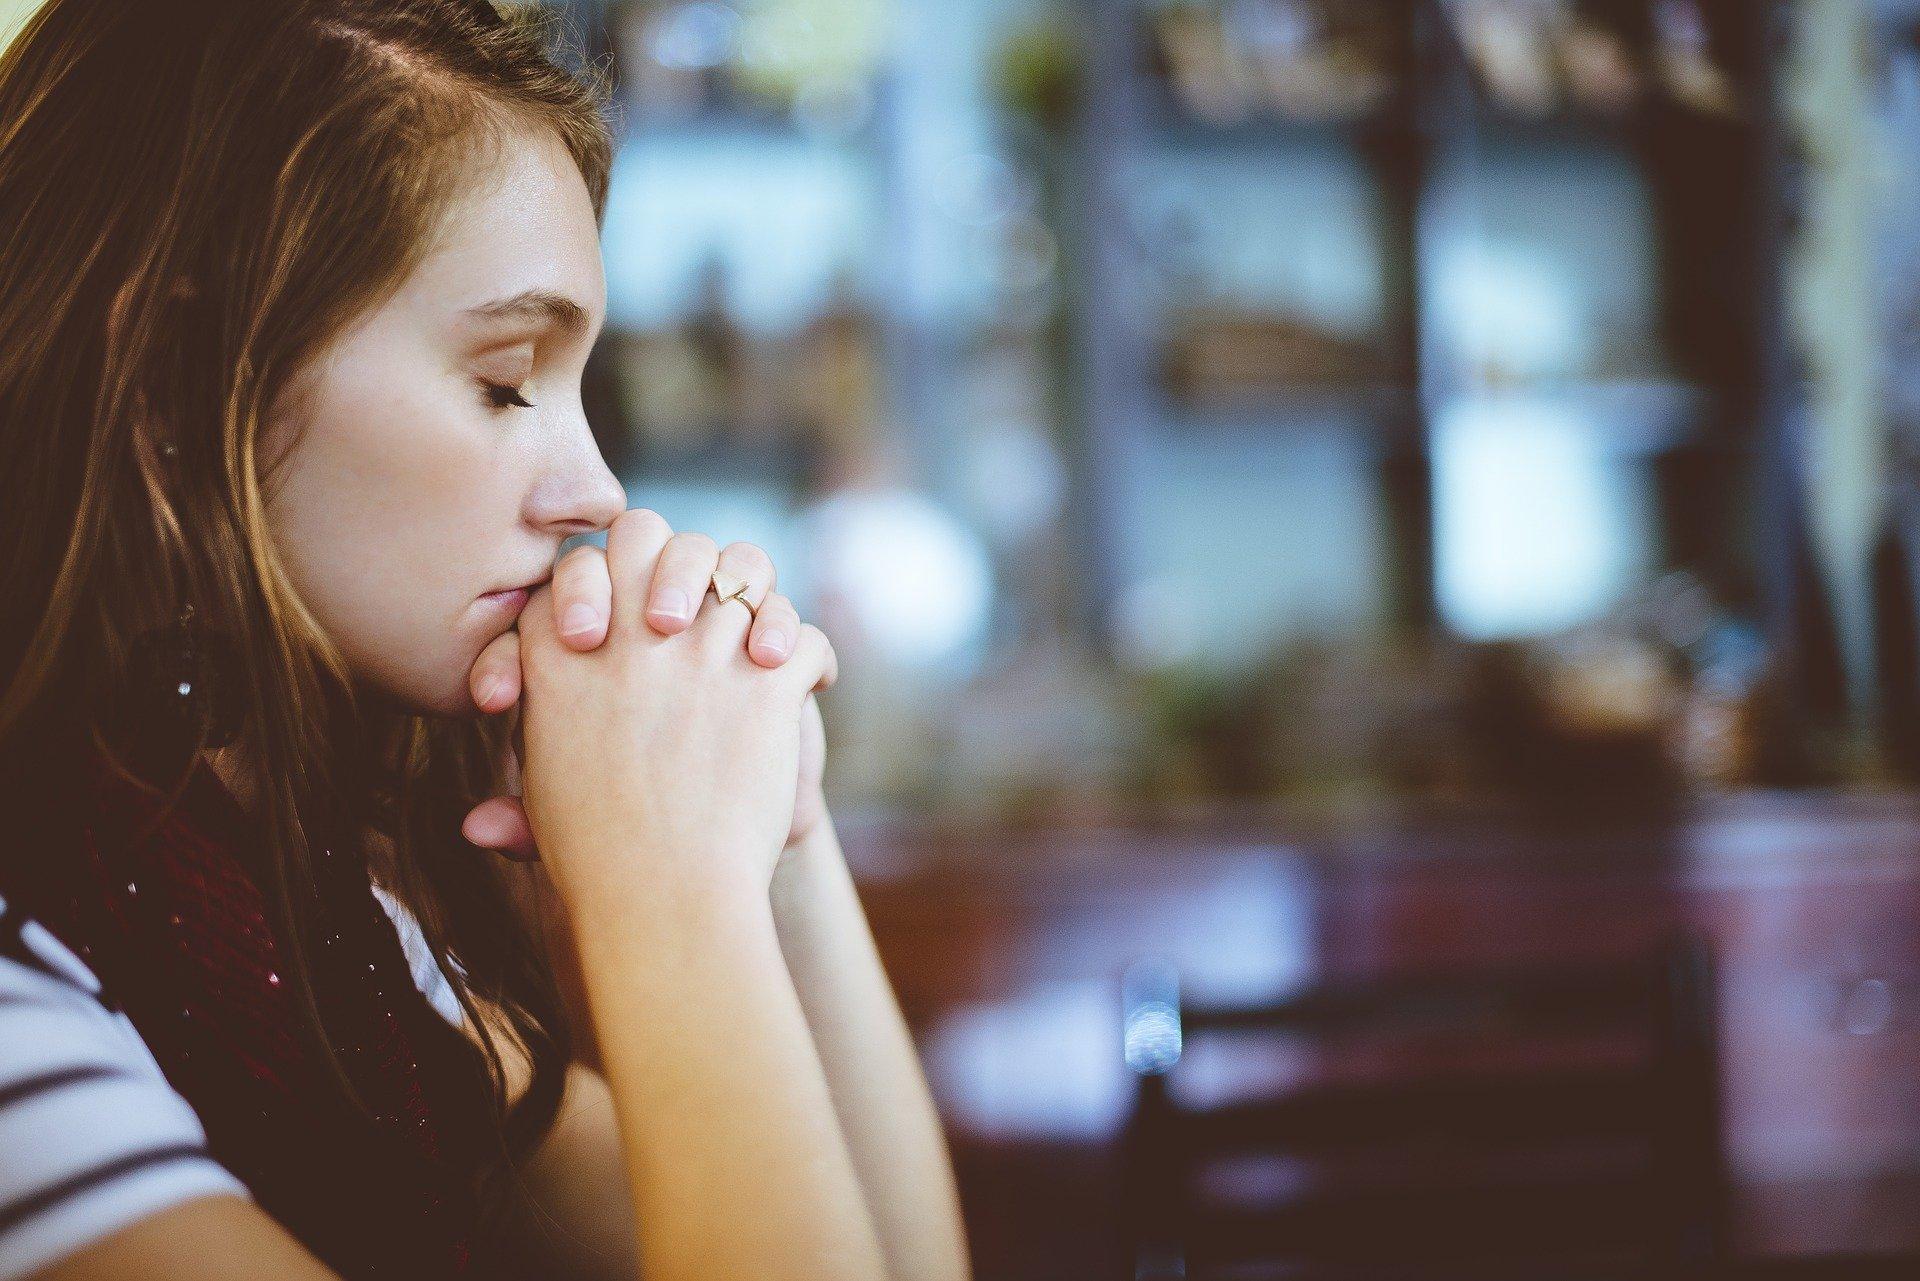 Mujer rezando. Fuente: Pixabay